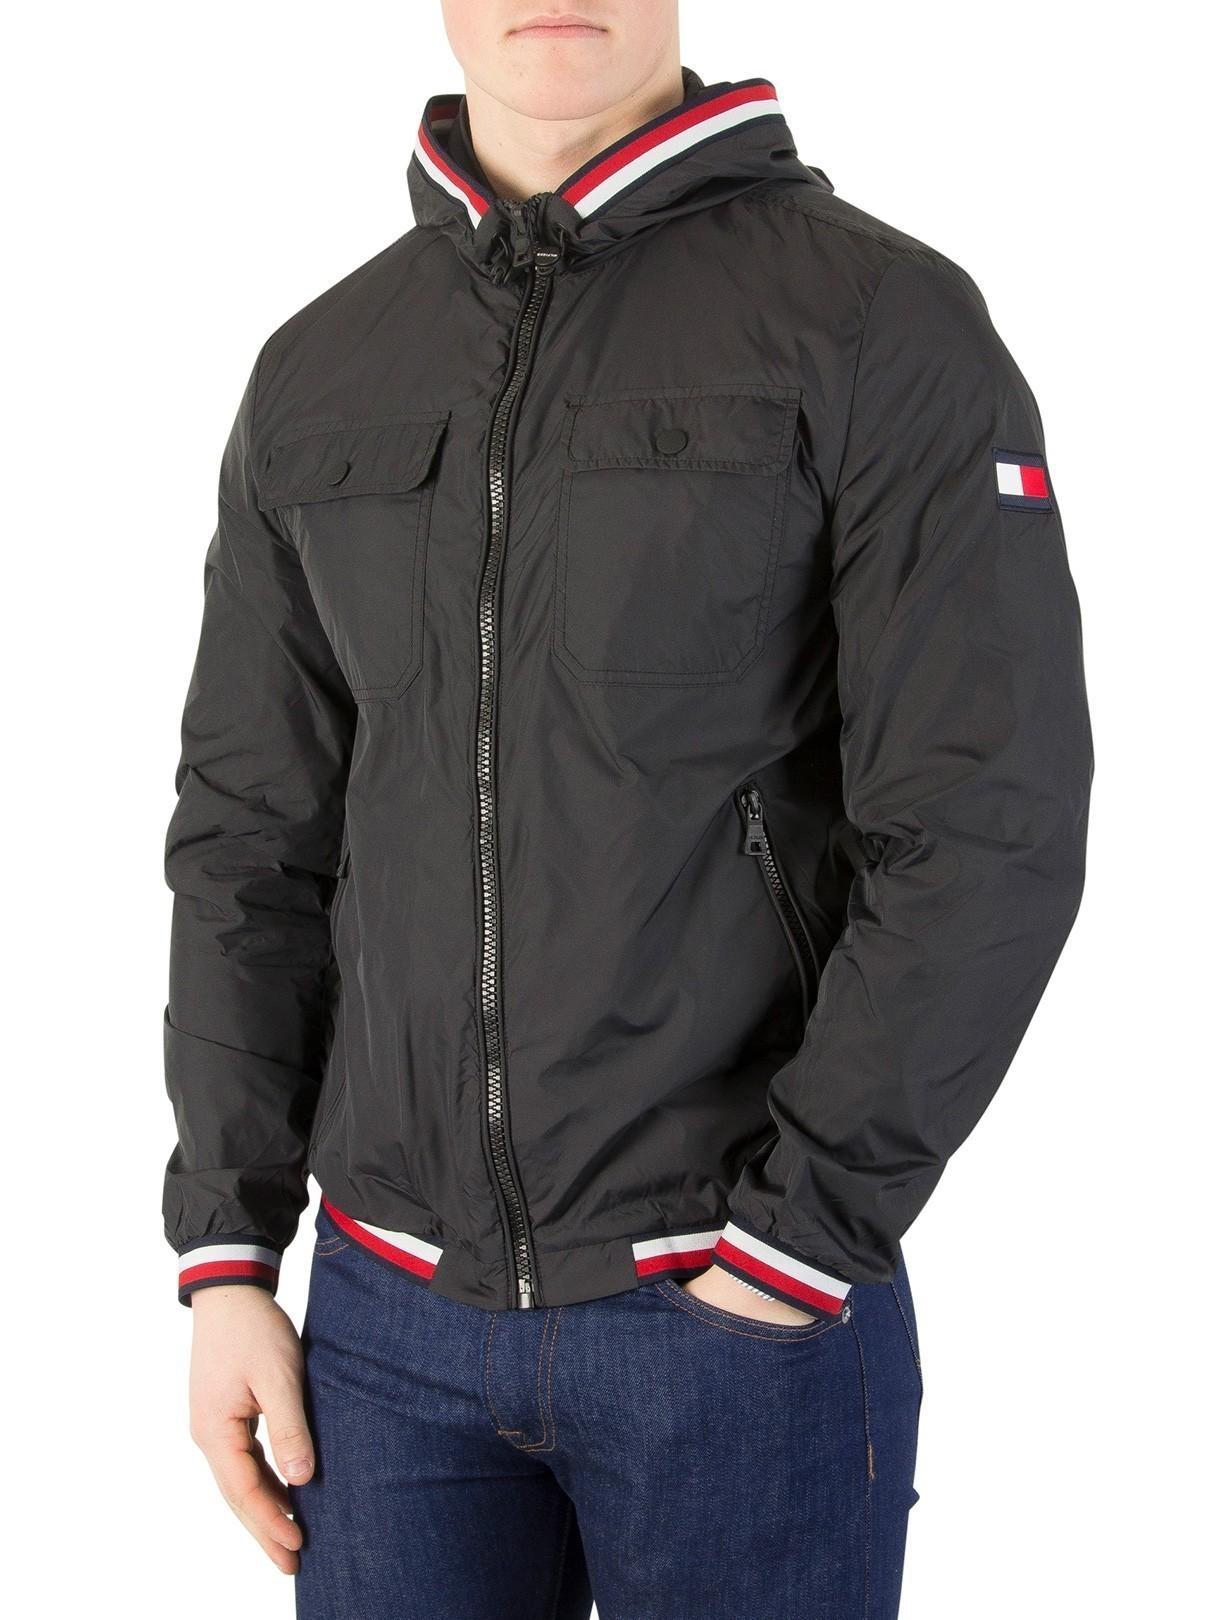 Leather Jackets & Coats|Men's Tommy Hilfiger Jet Black Nylon Tape Jacket